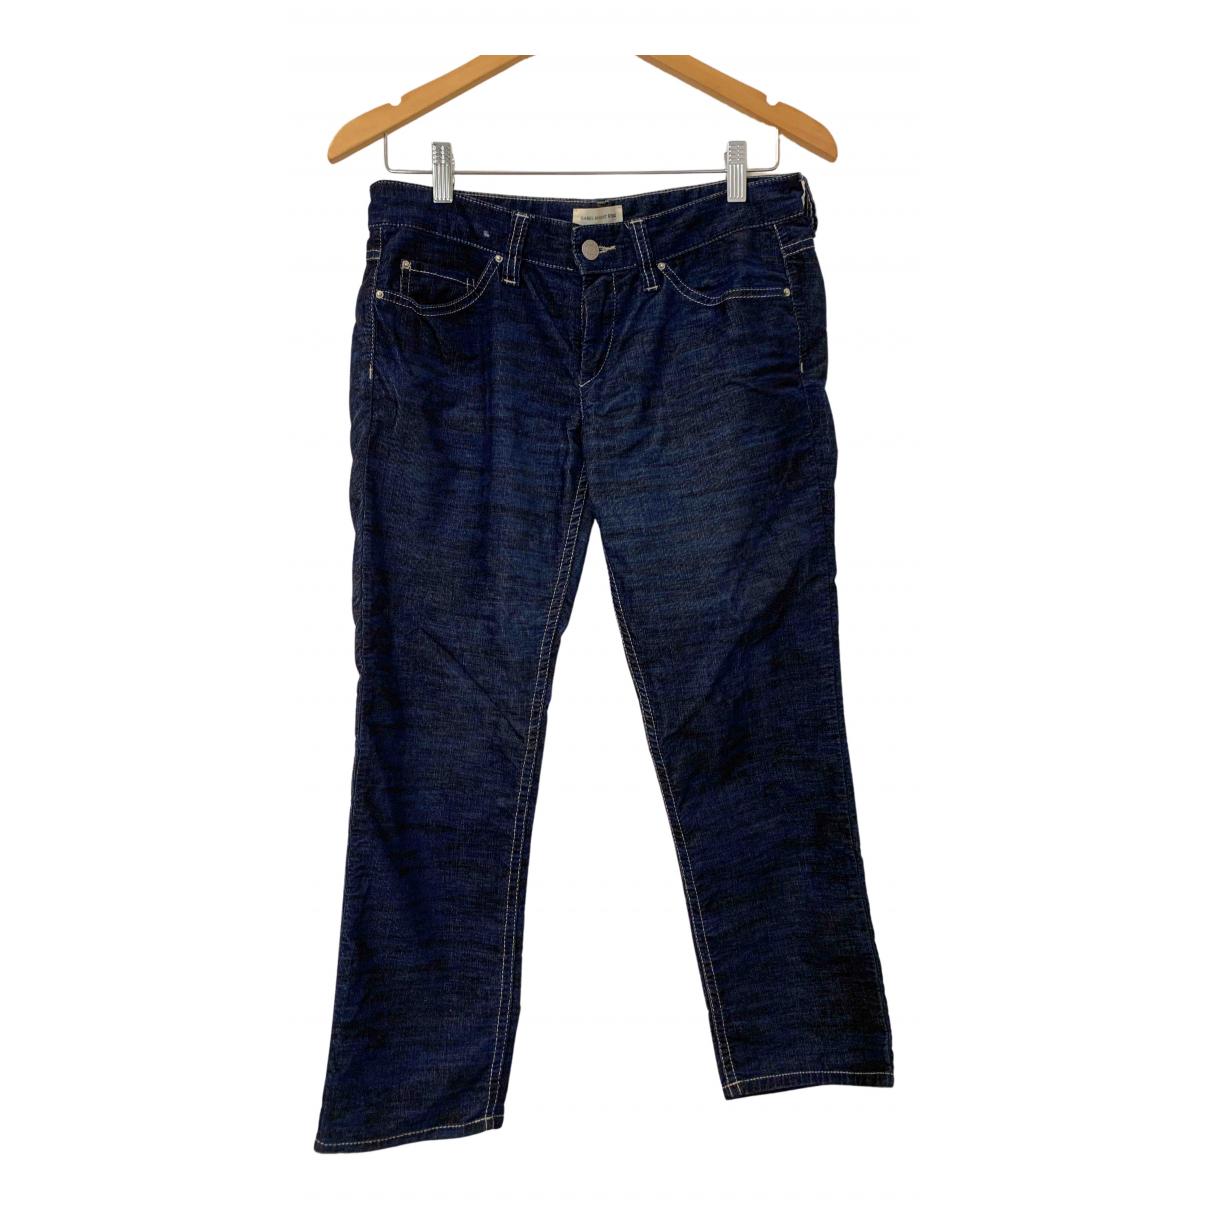 Isabel Marant Etoile N Blue Cotton Jeans for Women 38 FR